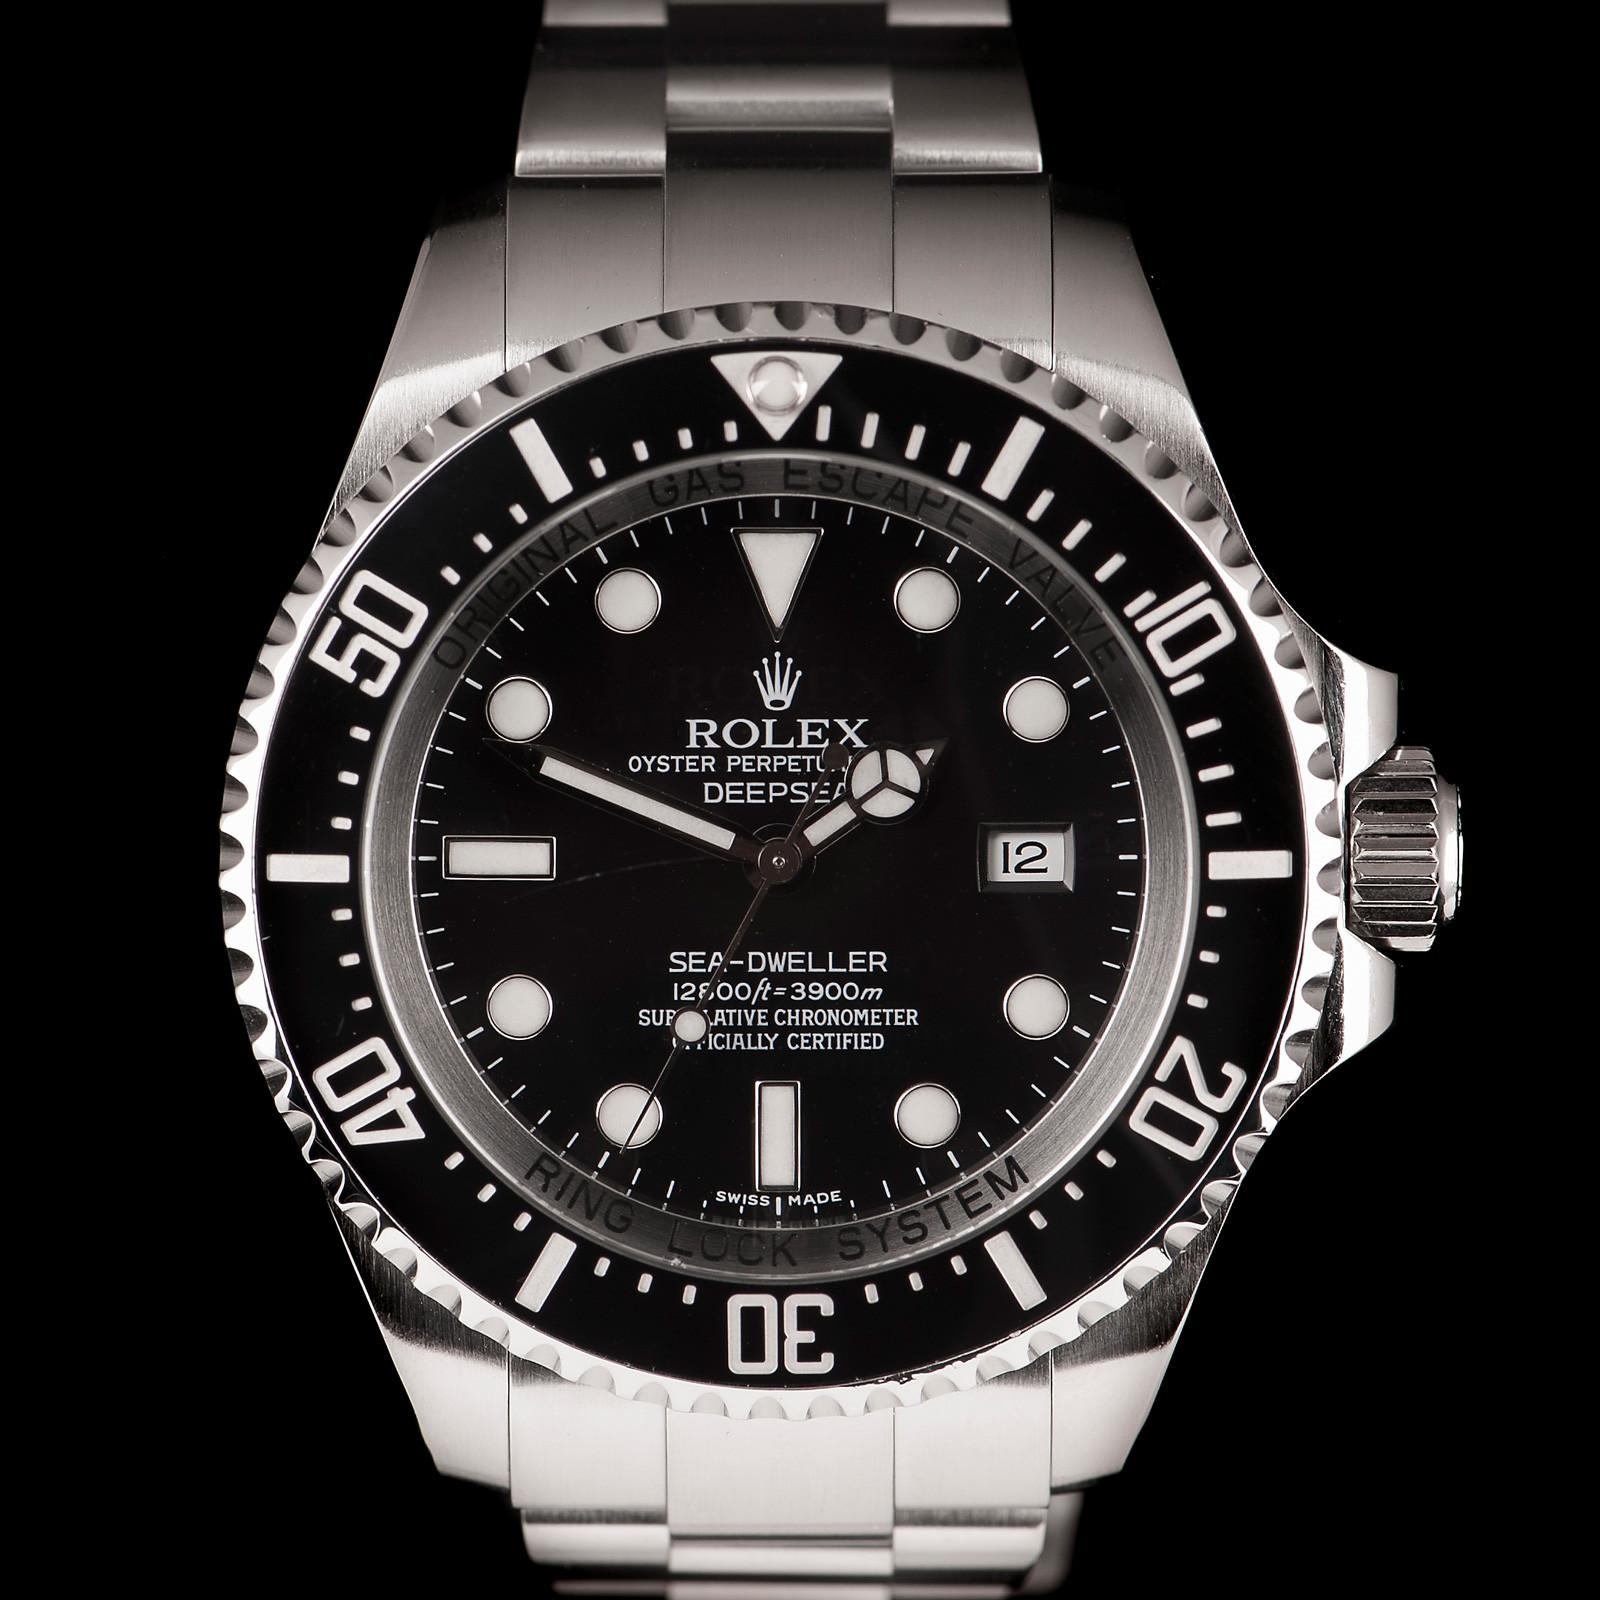 Rolex Seadweller Deepsea Ref 116660  44mm  Md Watches. Triangle Necklace. Emerald Necklace. Couple Bangle Bracelet. Amethist Engagement Rings. Wide Gold Bracelet. Buddhist Bracelet. Flashy Wedding Rings. Single Bangle Designs